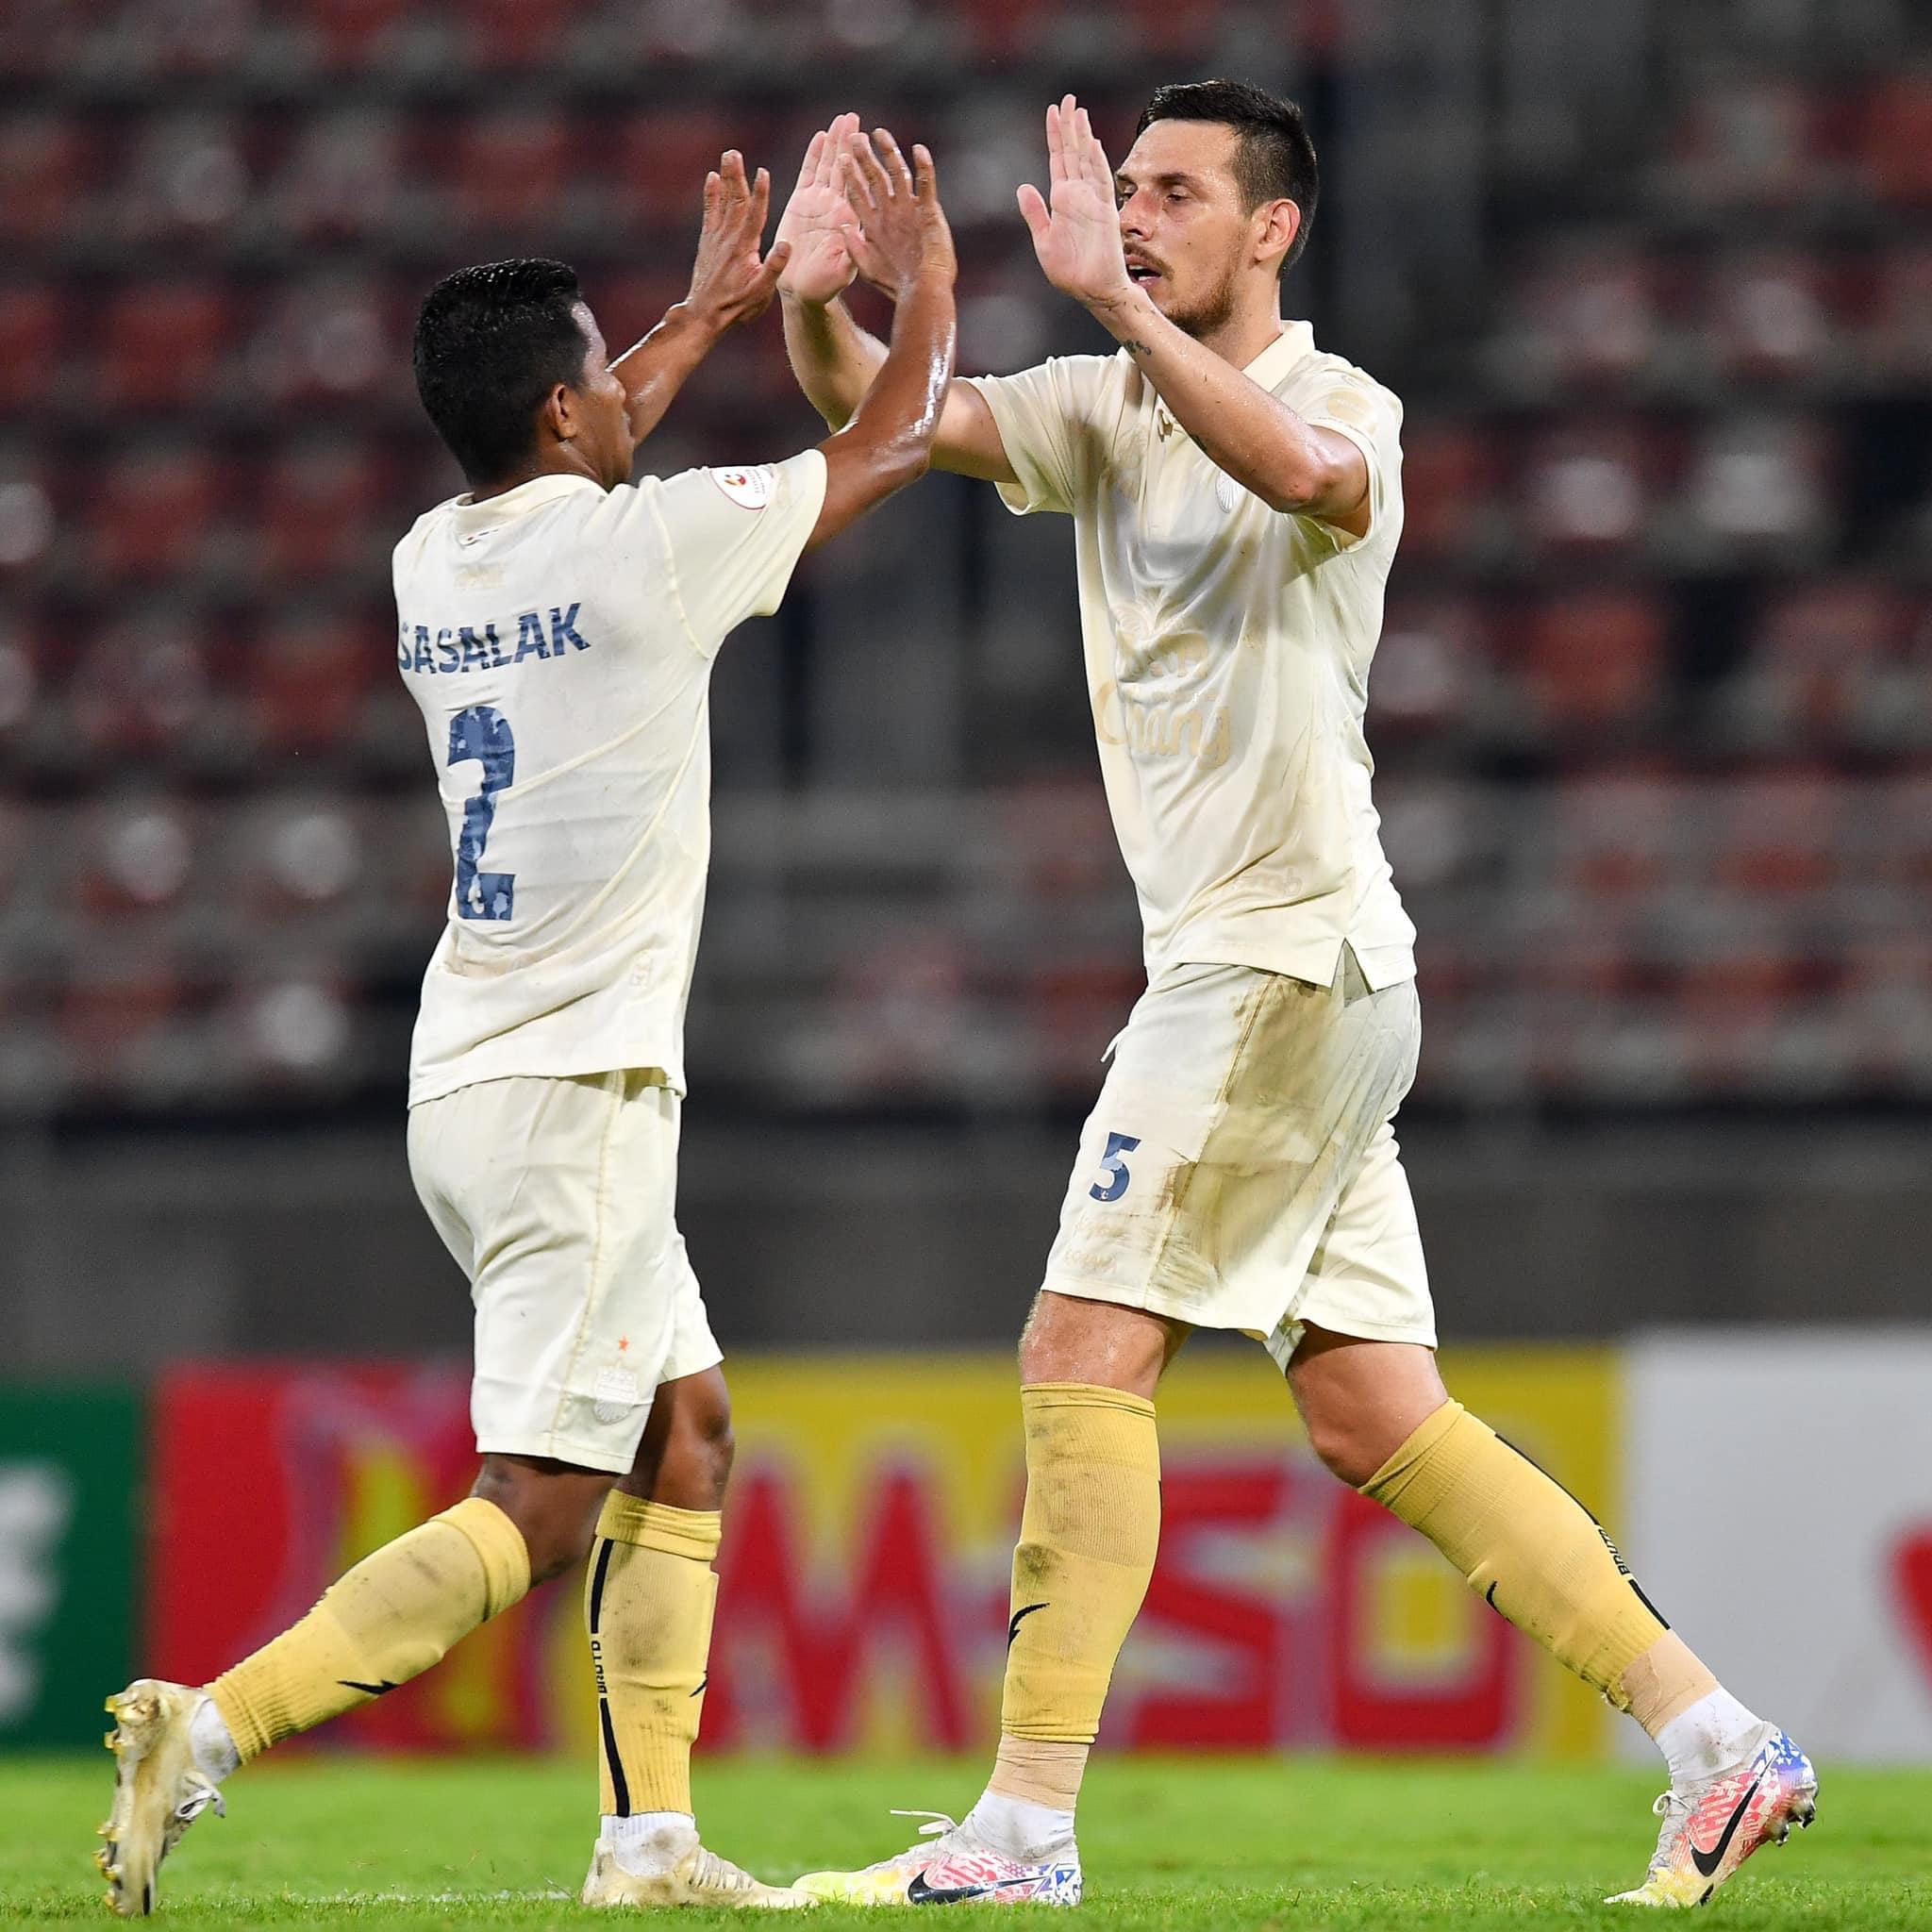 Kelic with his third goal in the season